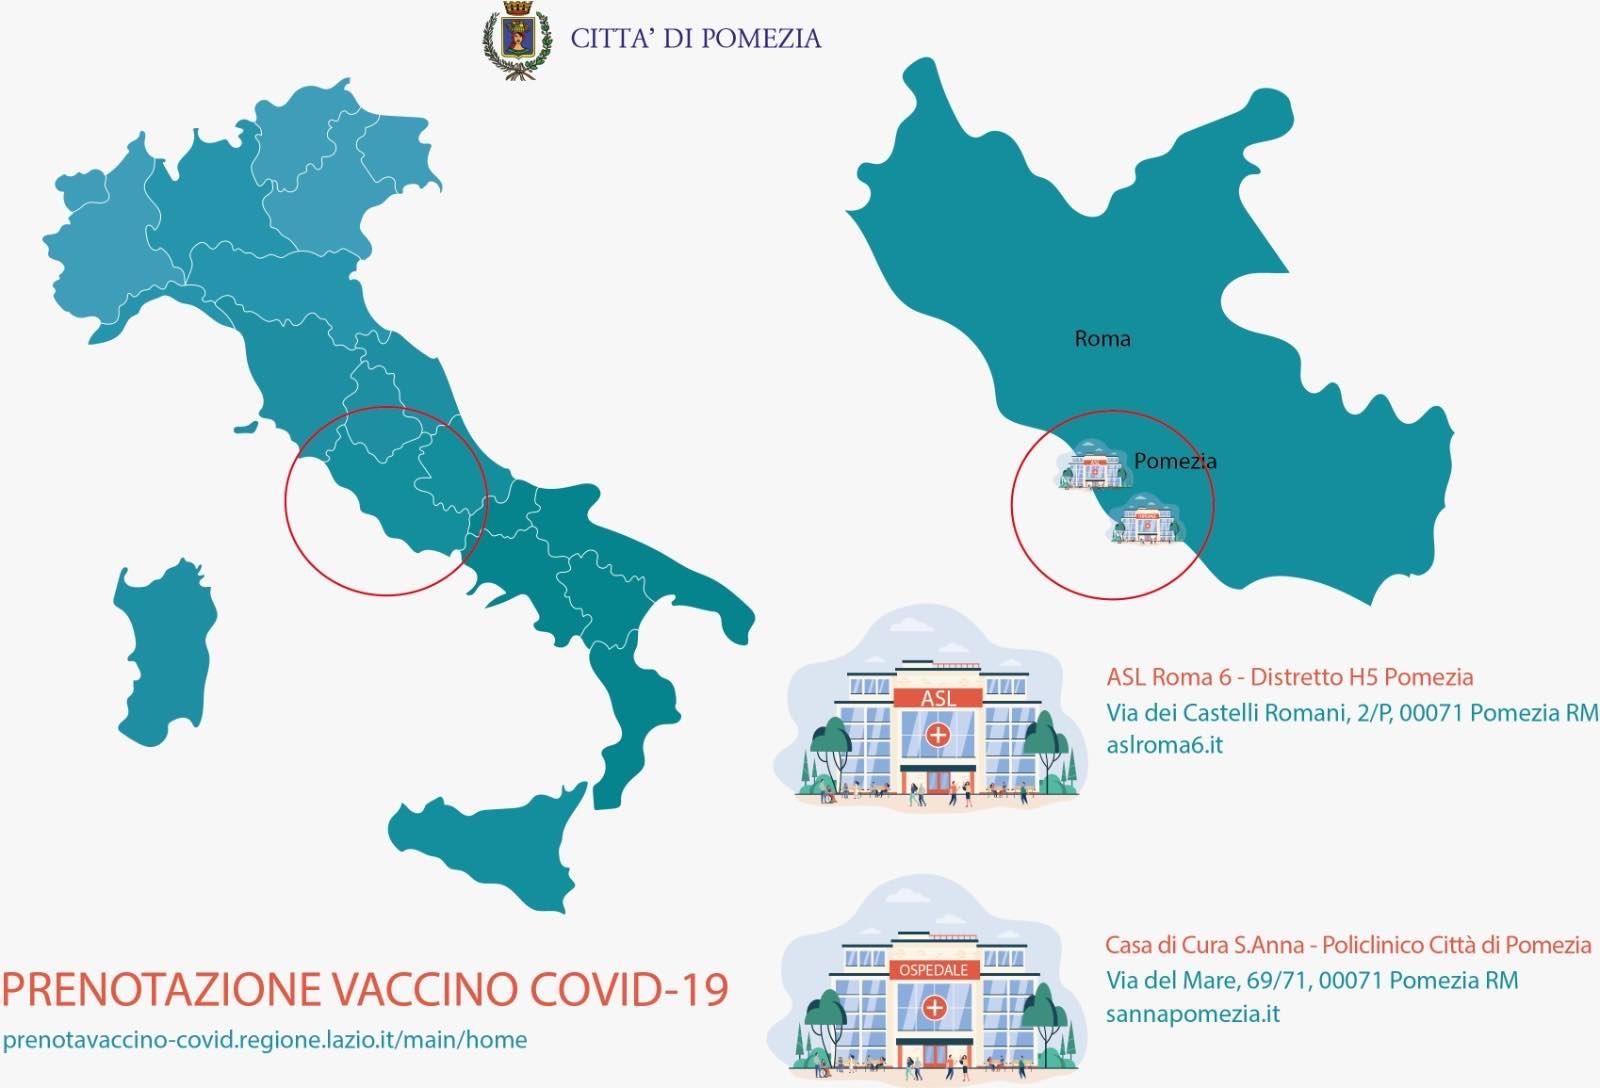 vaccino pomezia